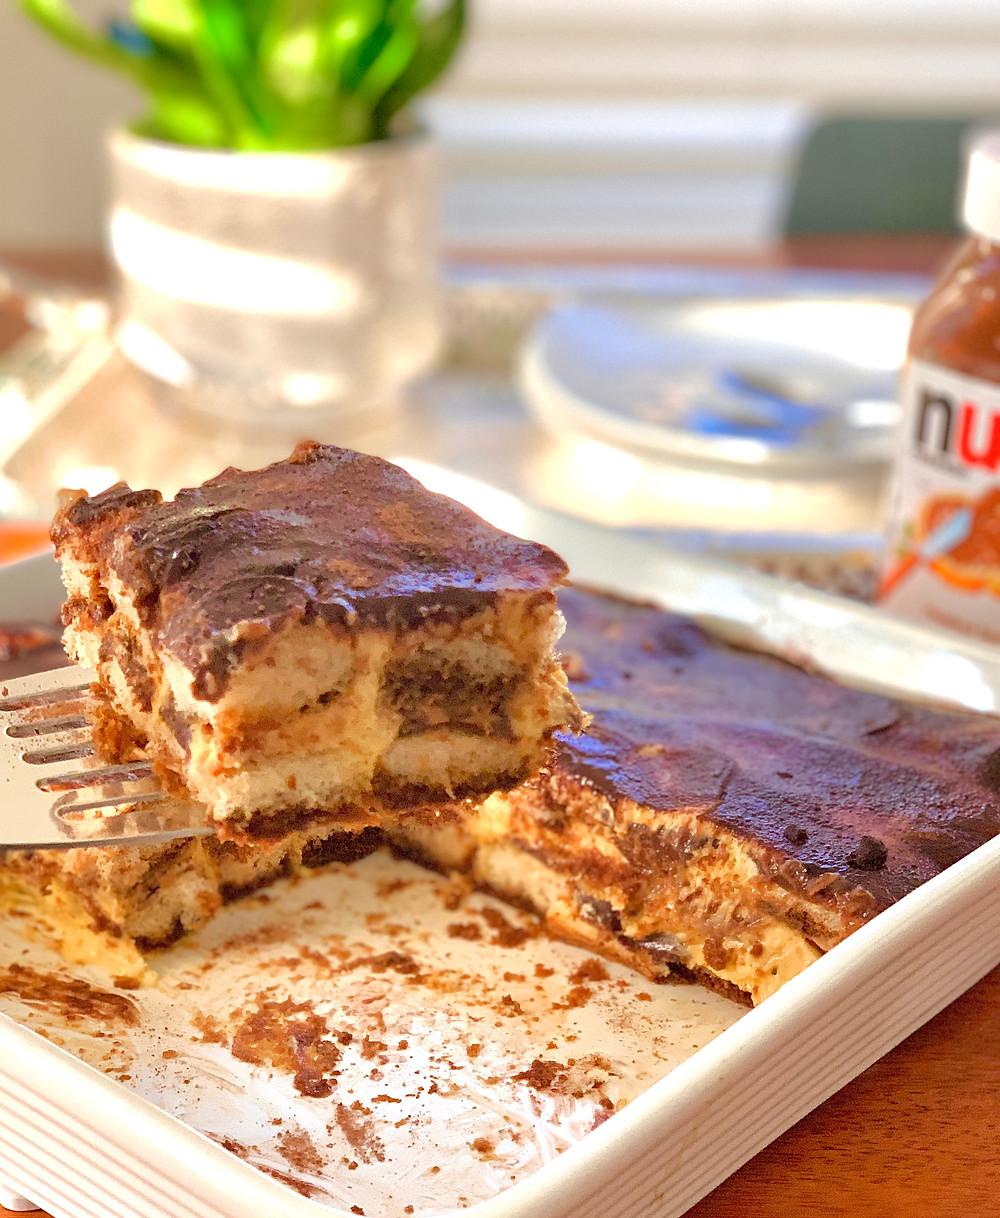 Nutella Tiramisu, a Slight Twist to the Classic Italian Dessert